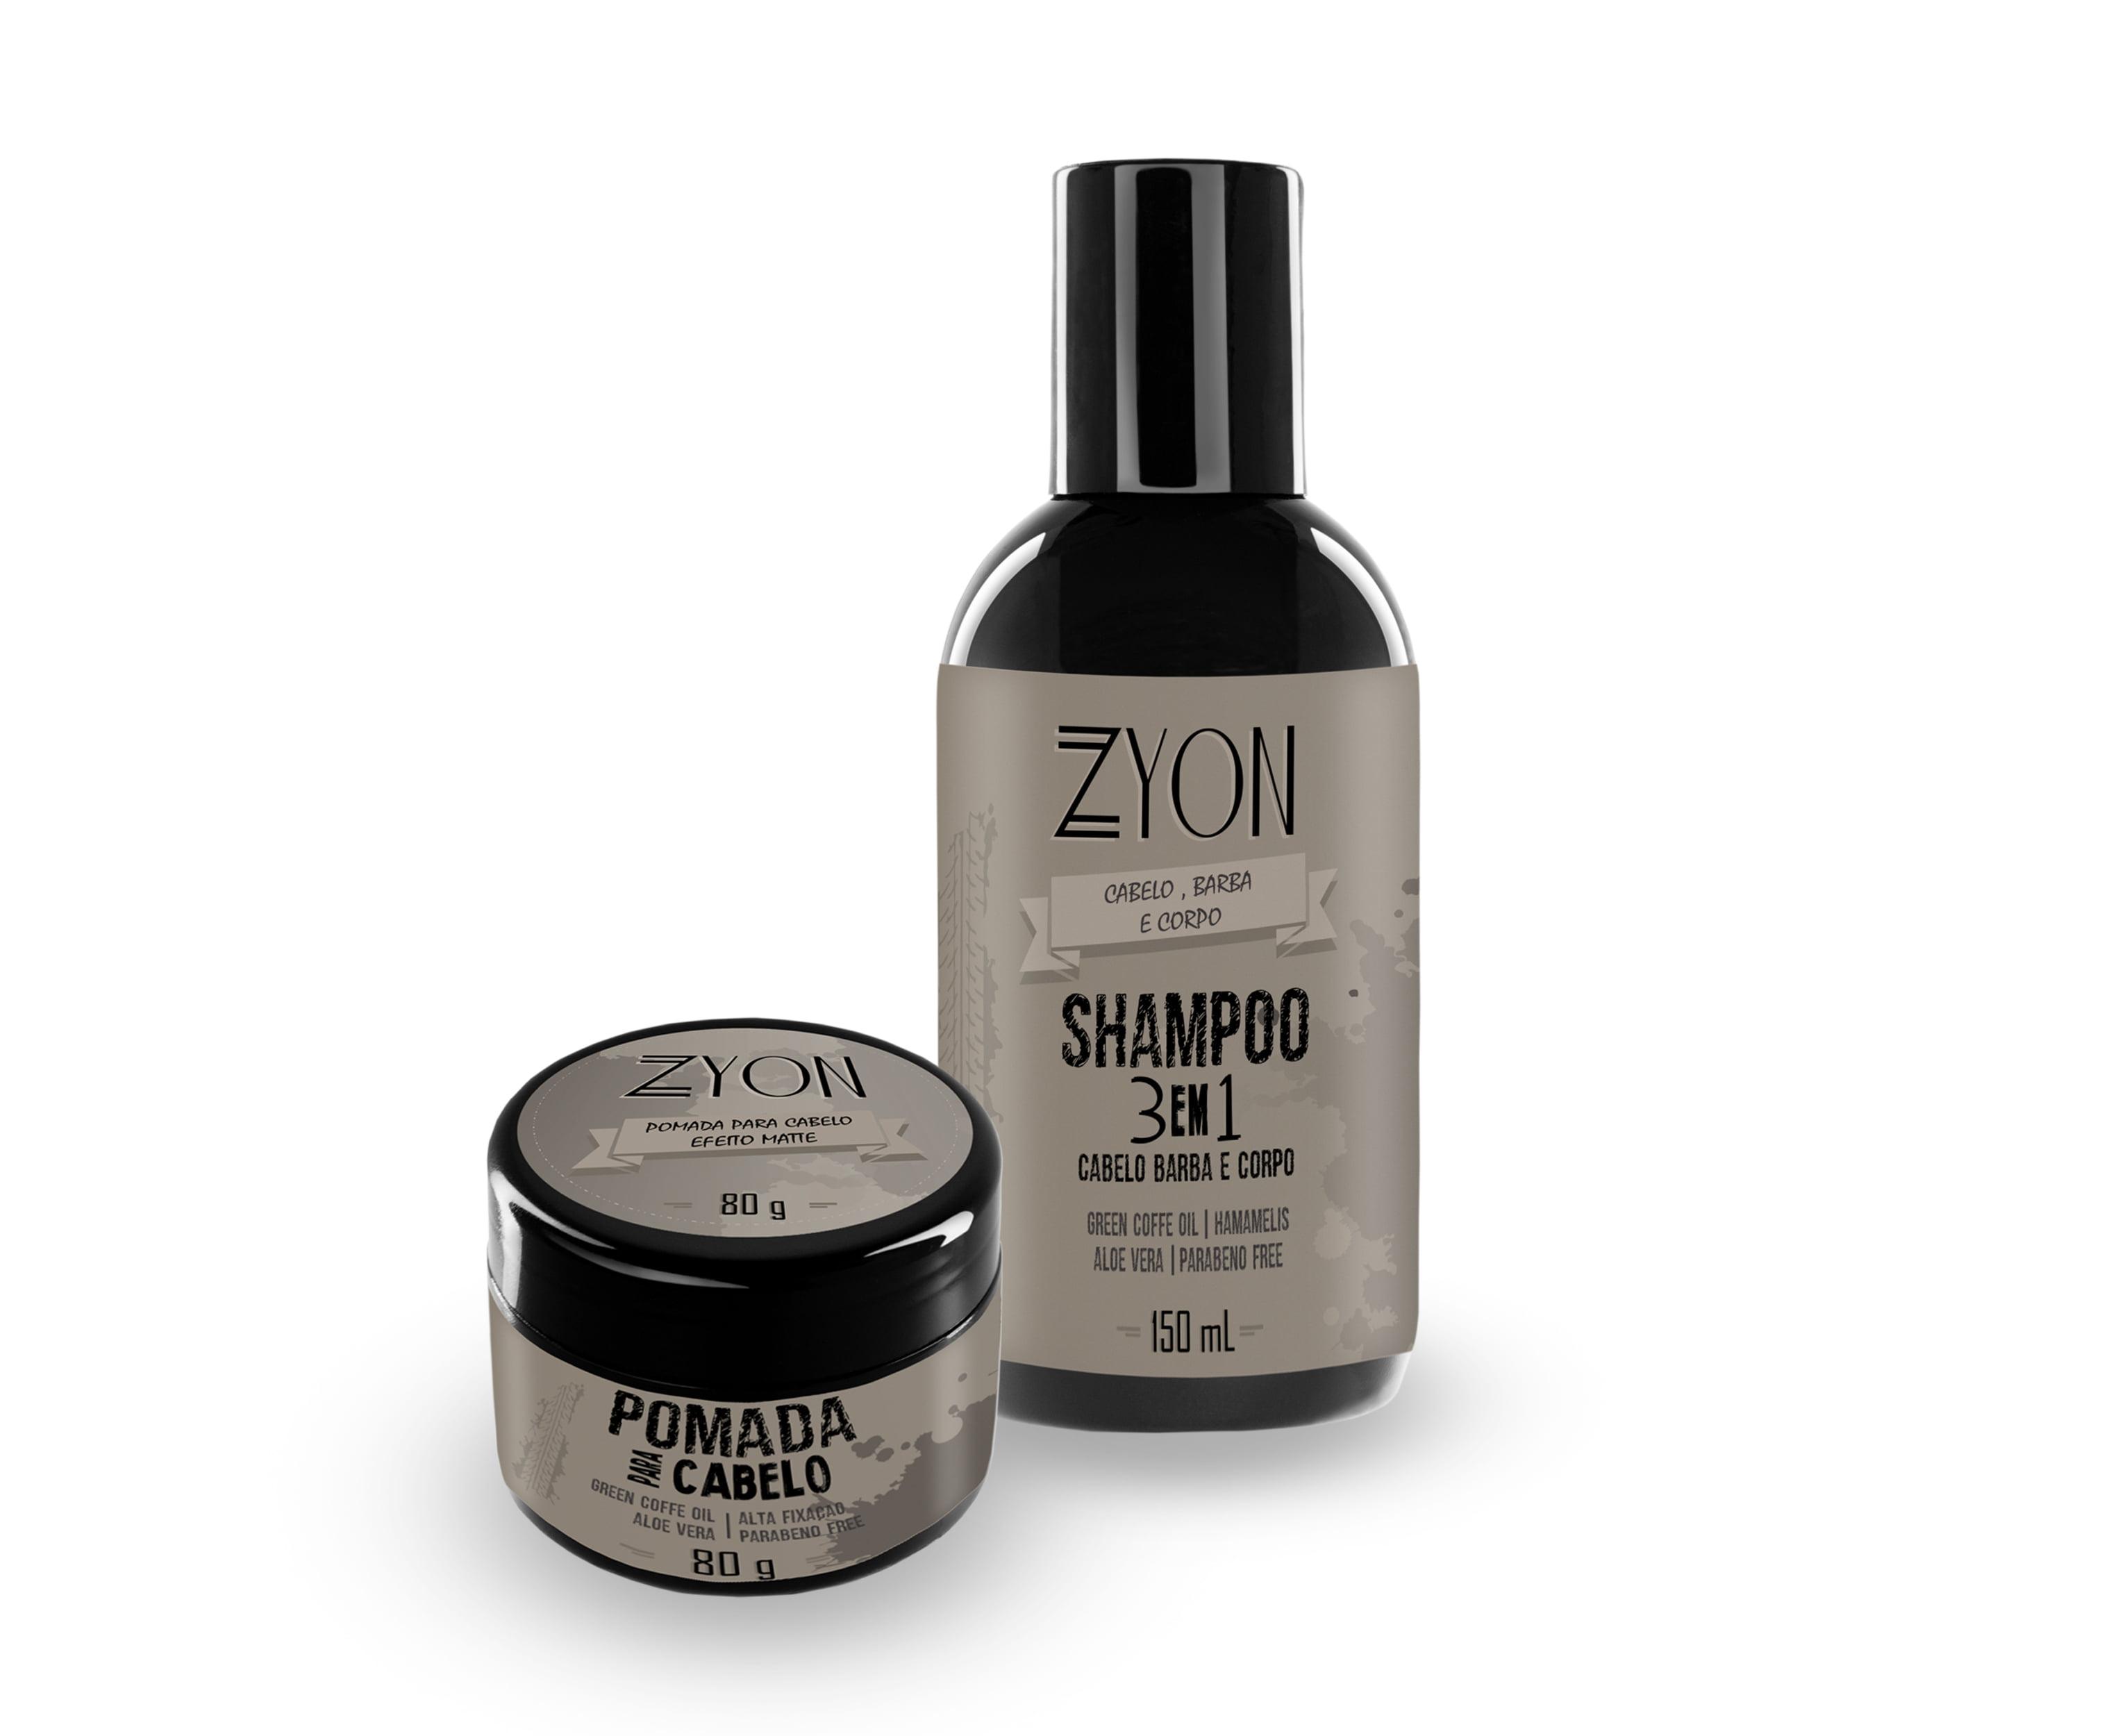 Kit Shampoo e Pomada Matte